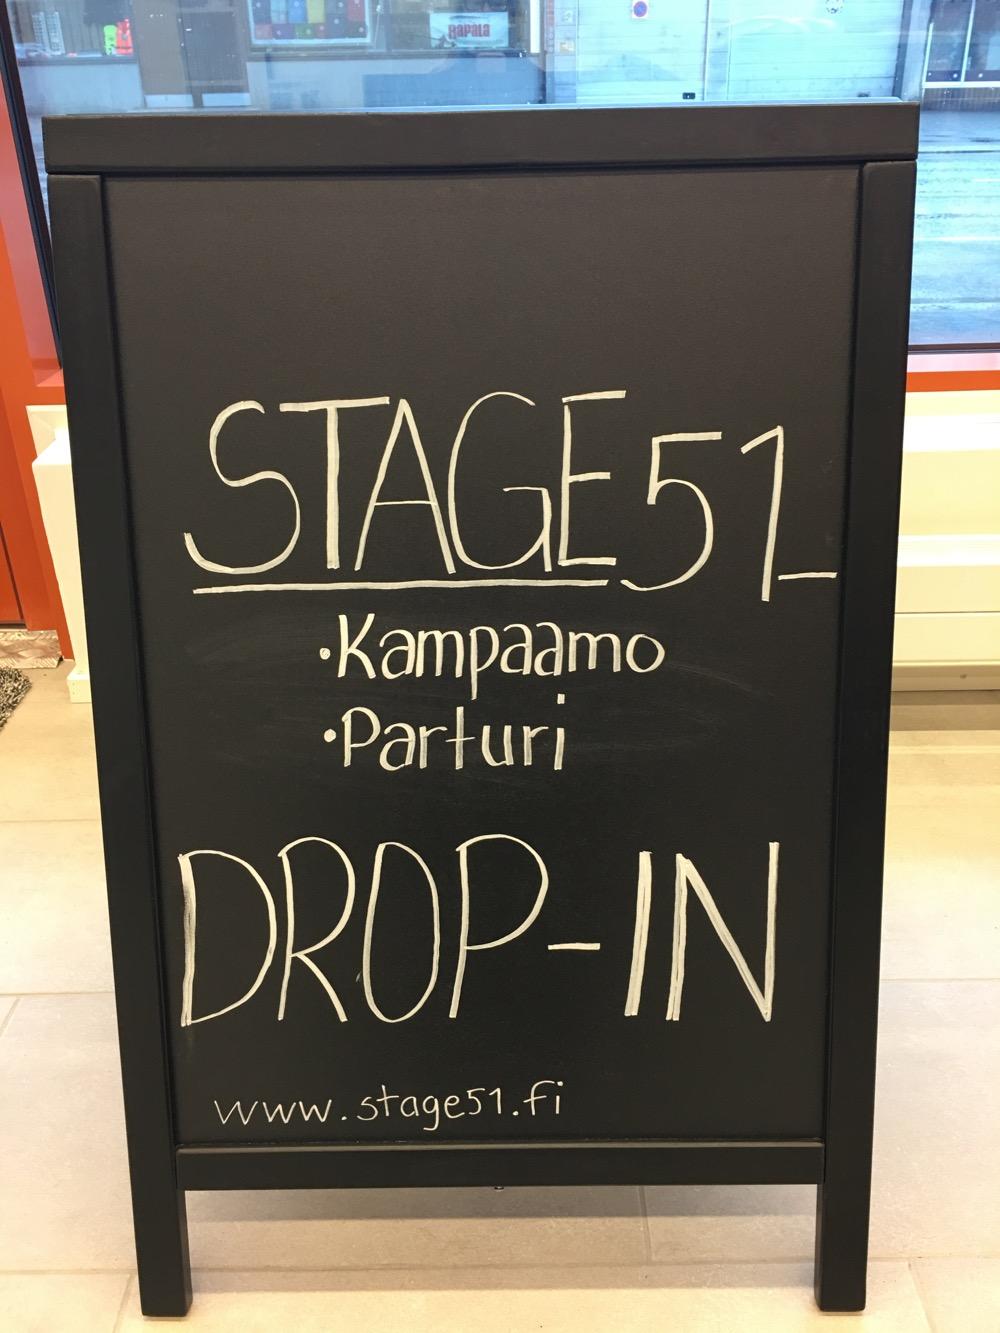 Uusi kampaamo Stage 51